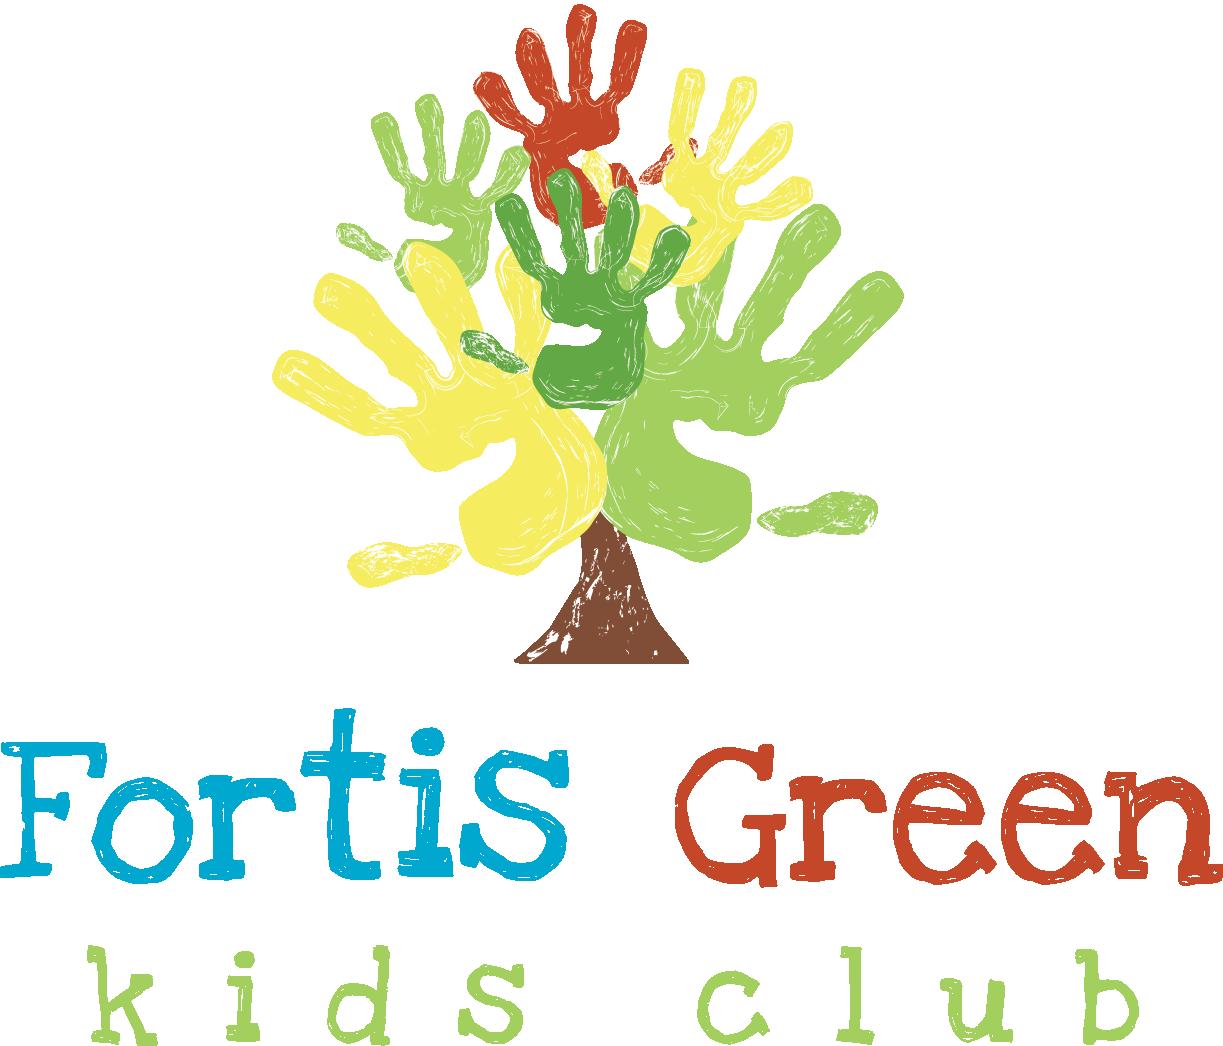 FORTIS GREEN